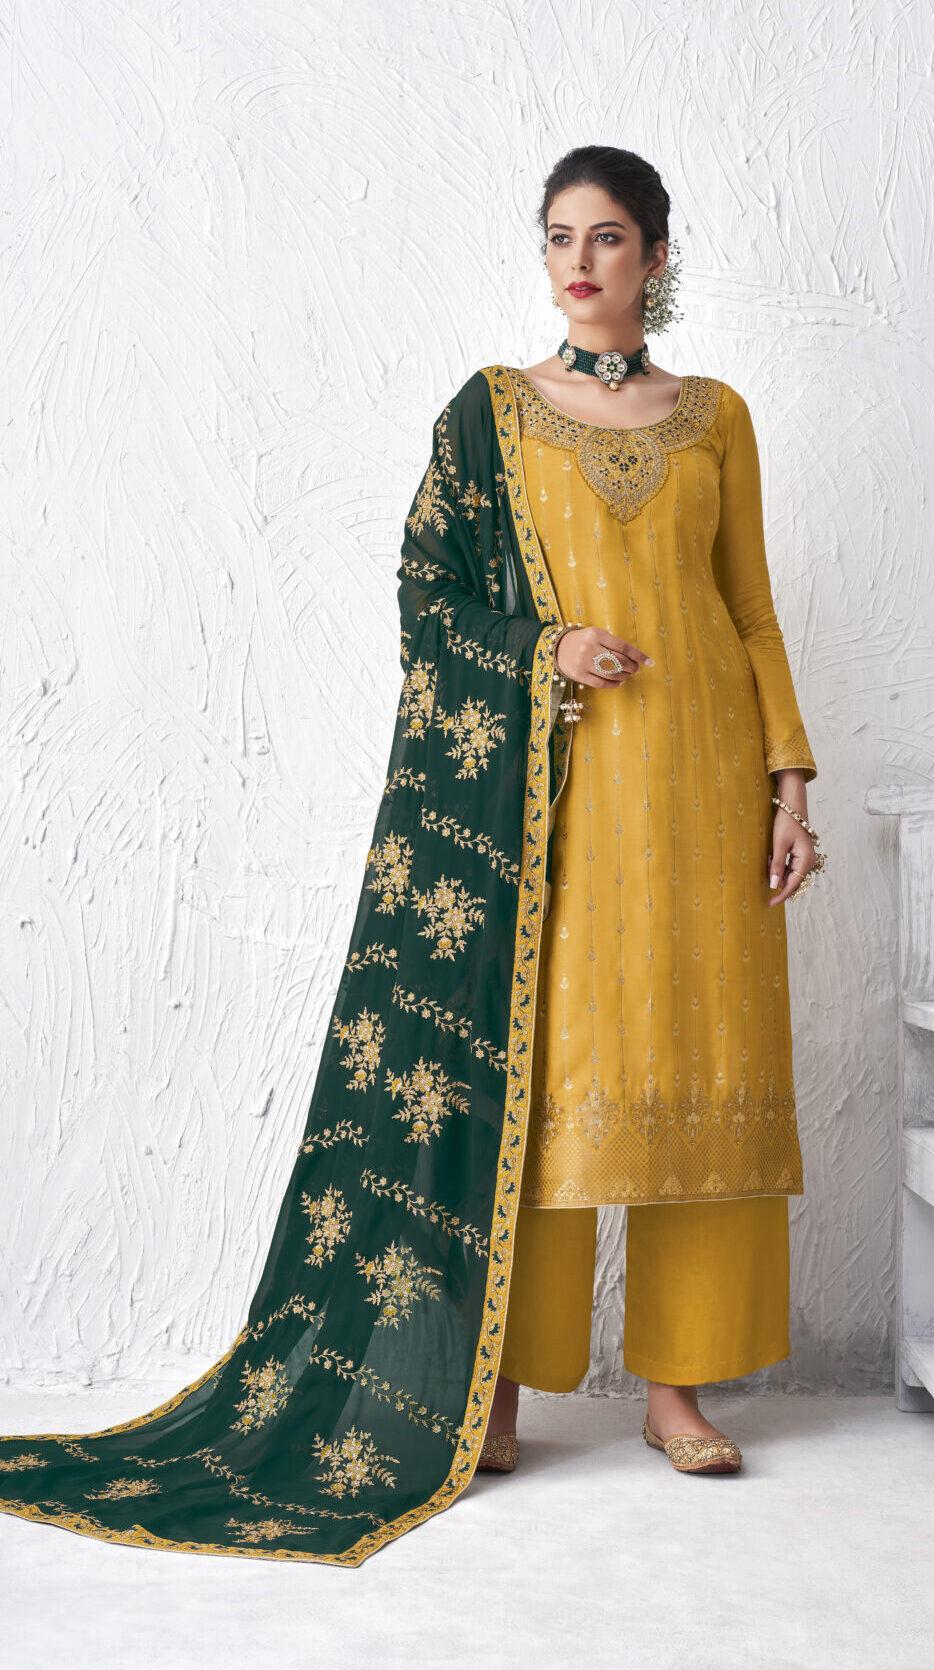 Yellow Salwar Suits with Green Dupatta Bridal Punjabi Suits